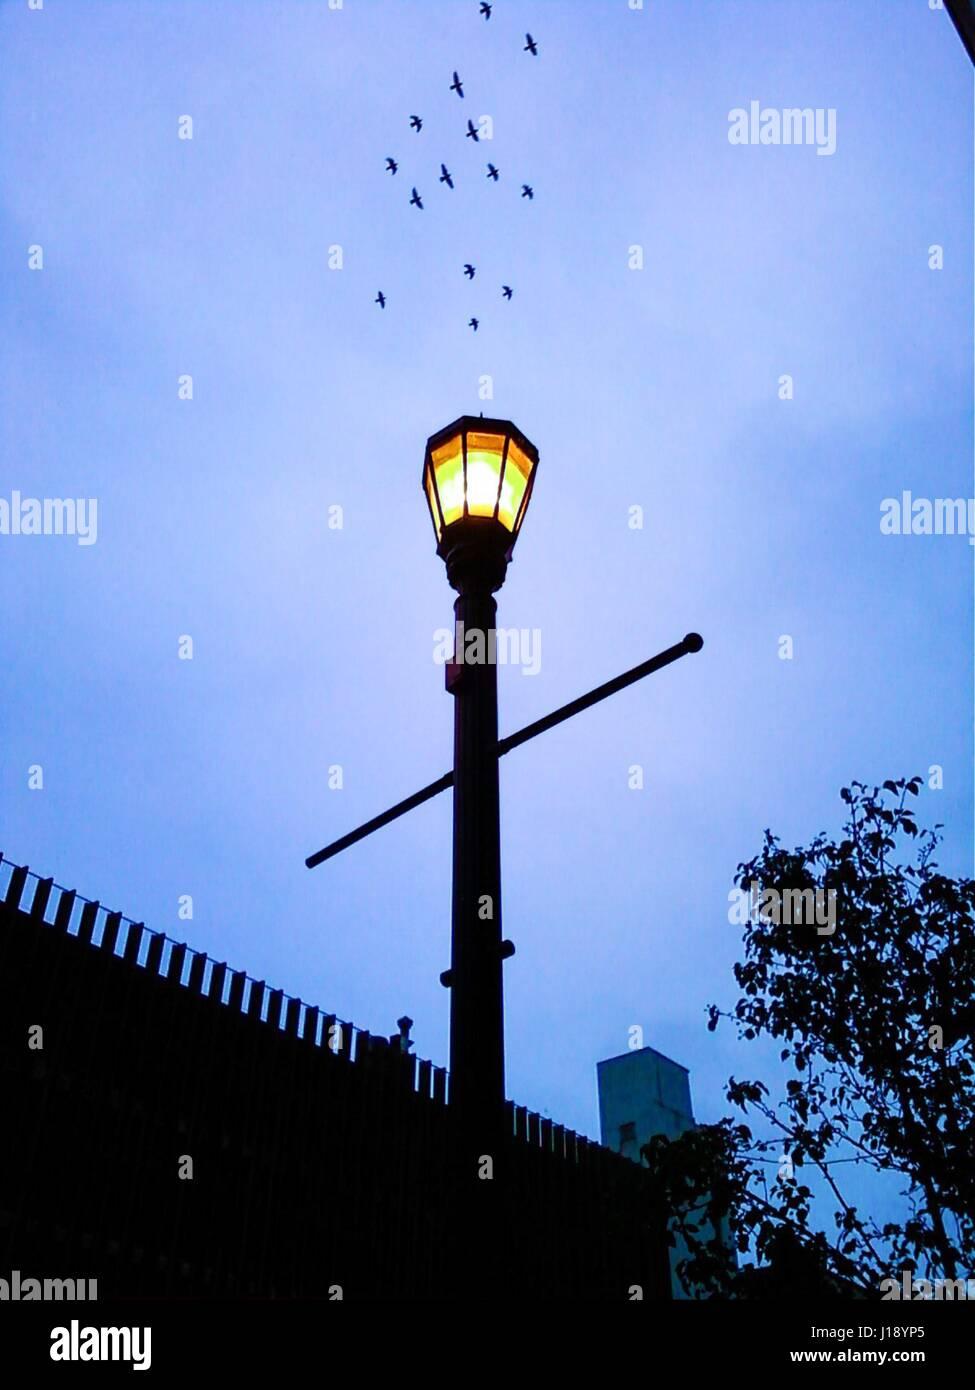 Guiding Light. Guiding Light - Stock Image